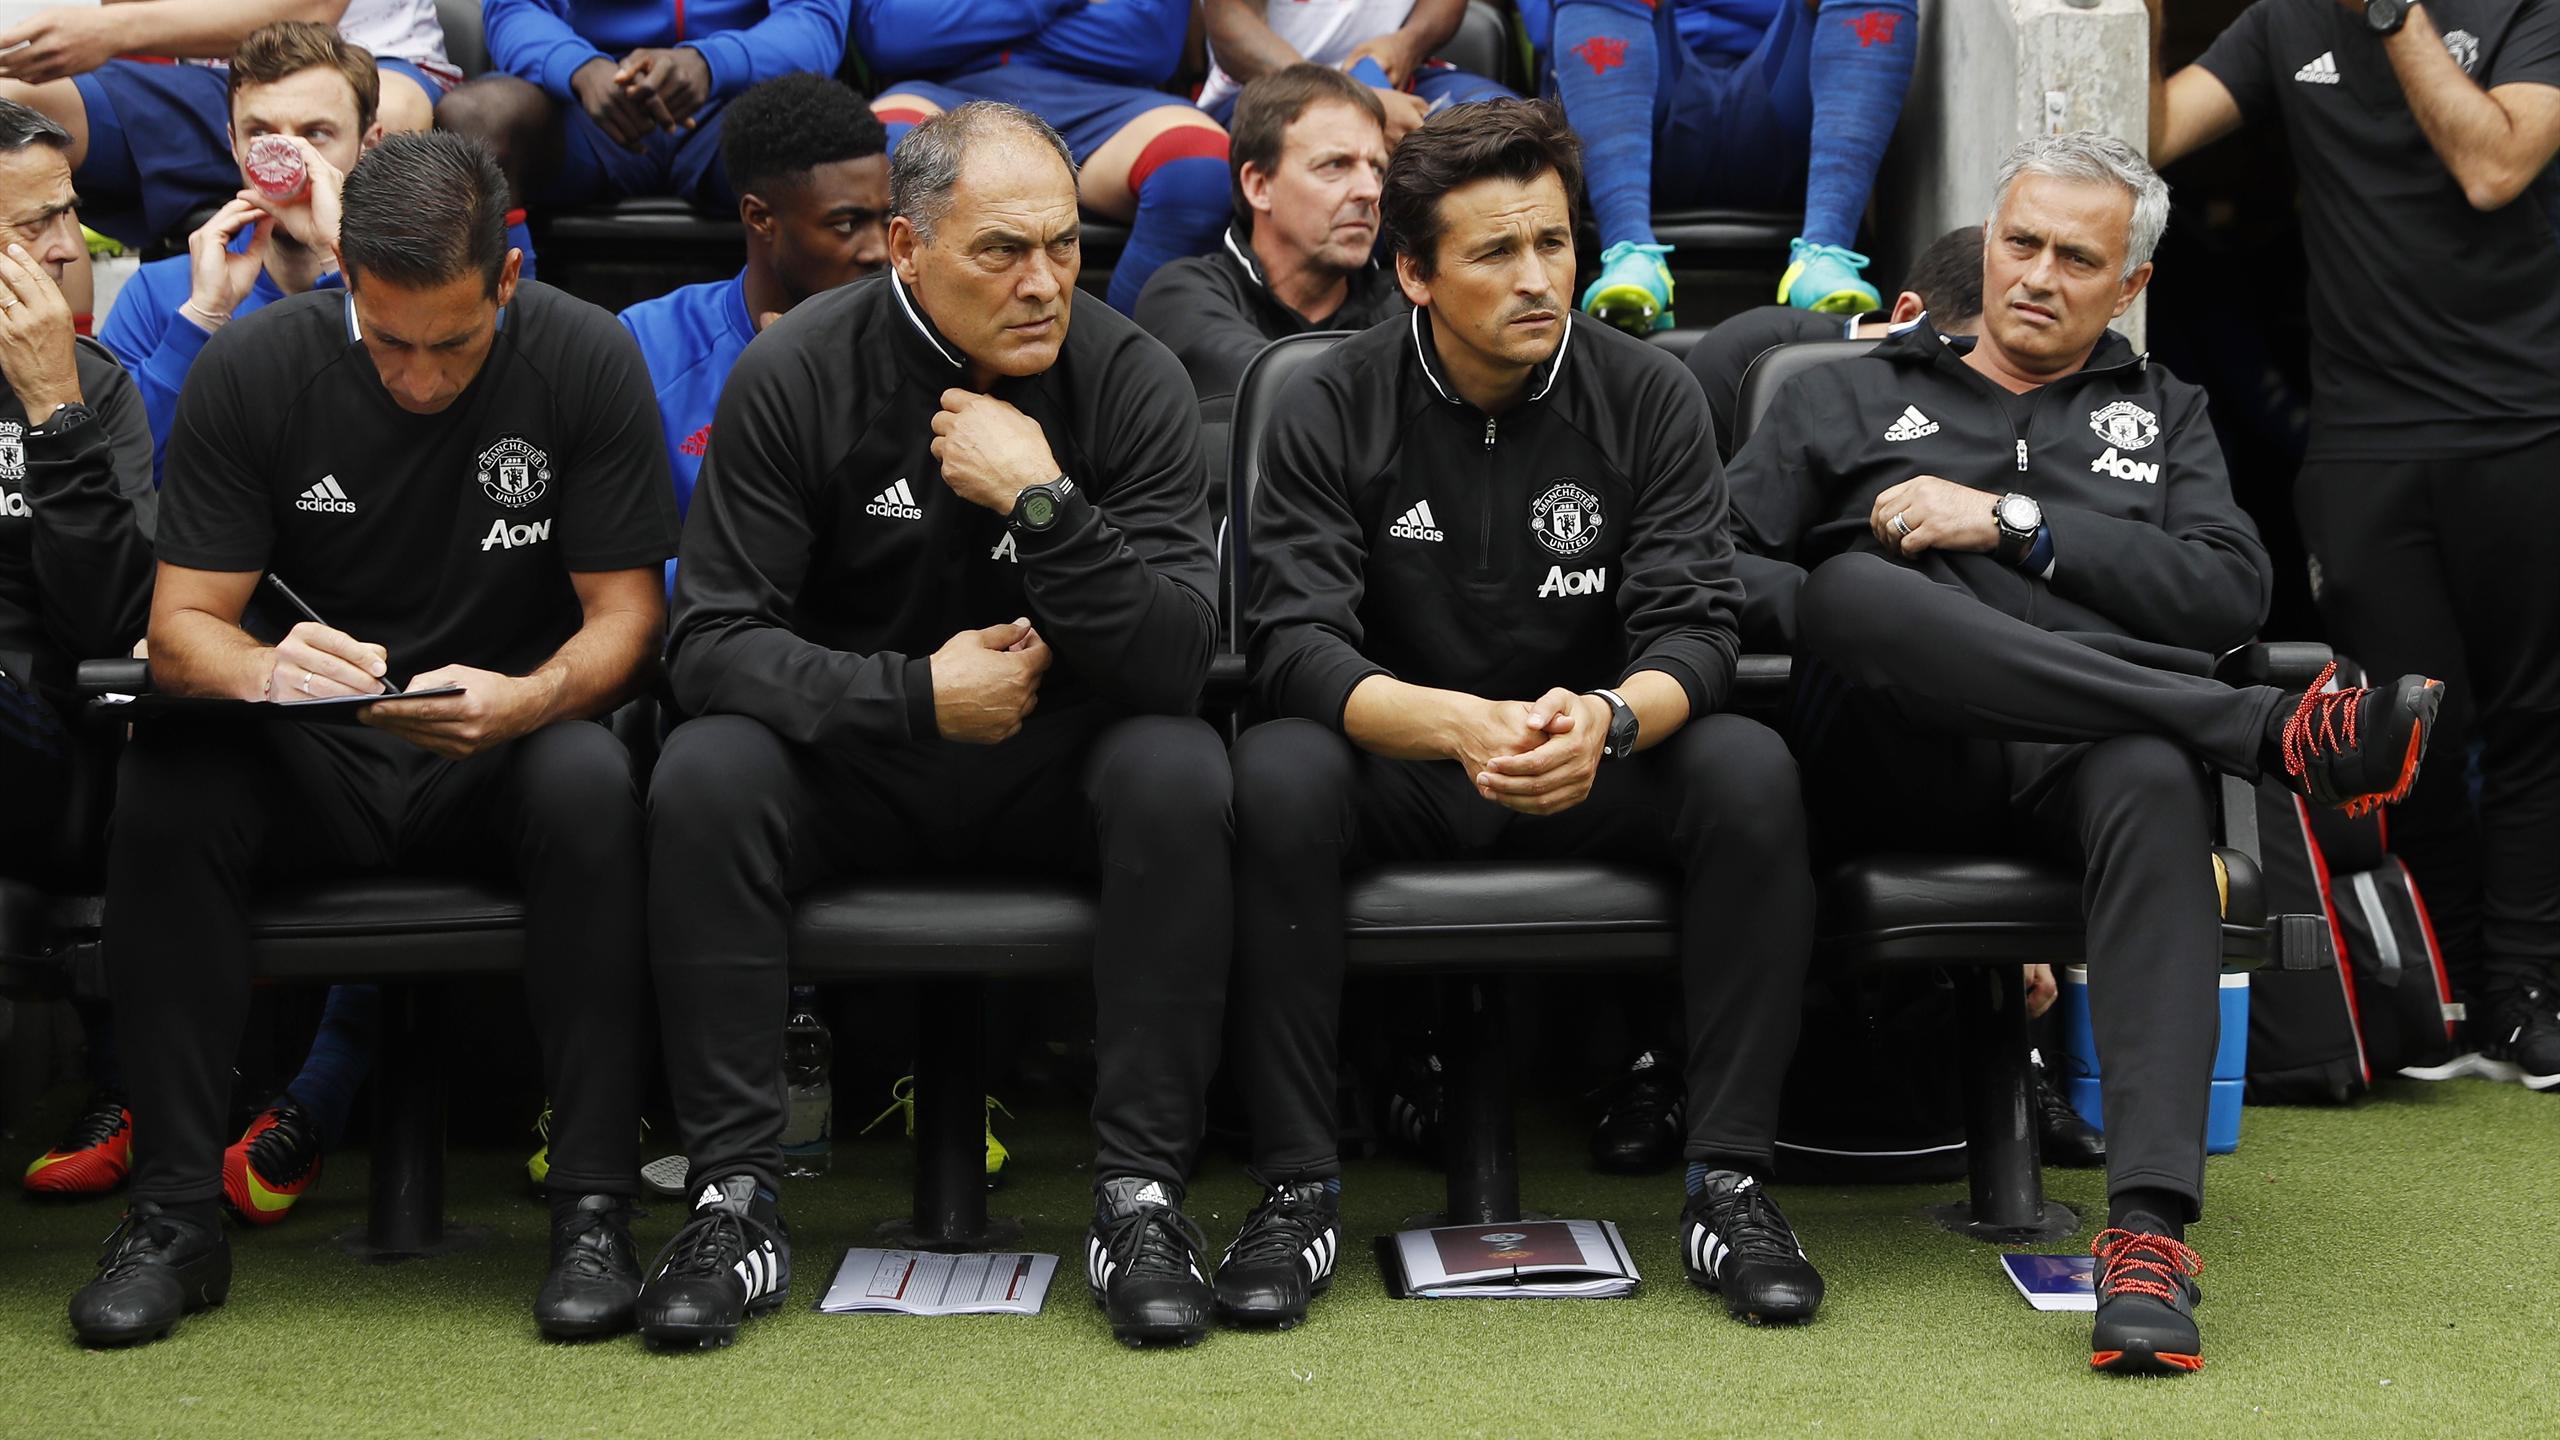 Manchester United coach Emilio Alvarez, Silvino Louro, assistant manager Rui Faria and manager Jose Mourinho